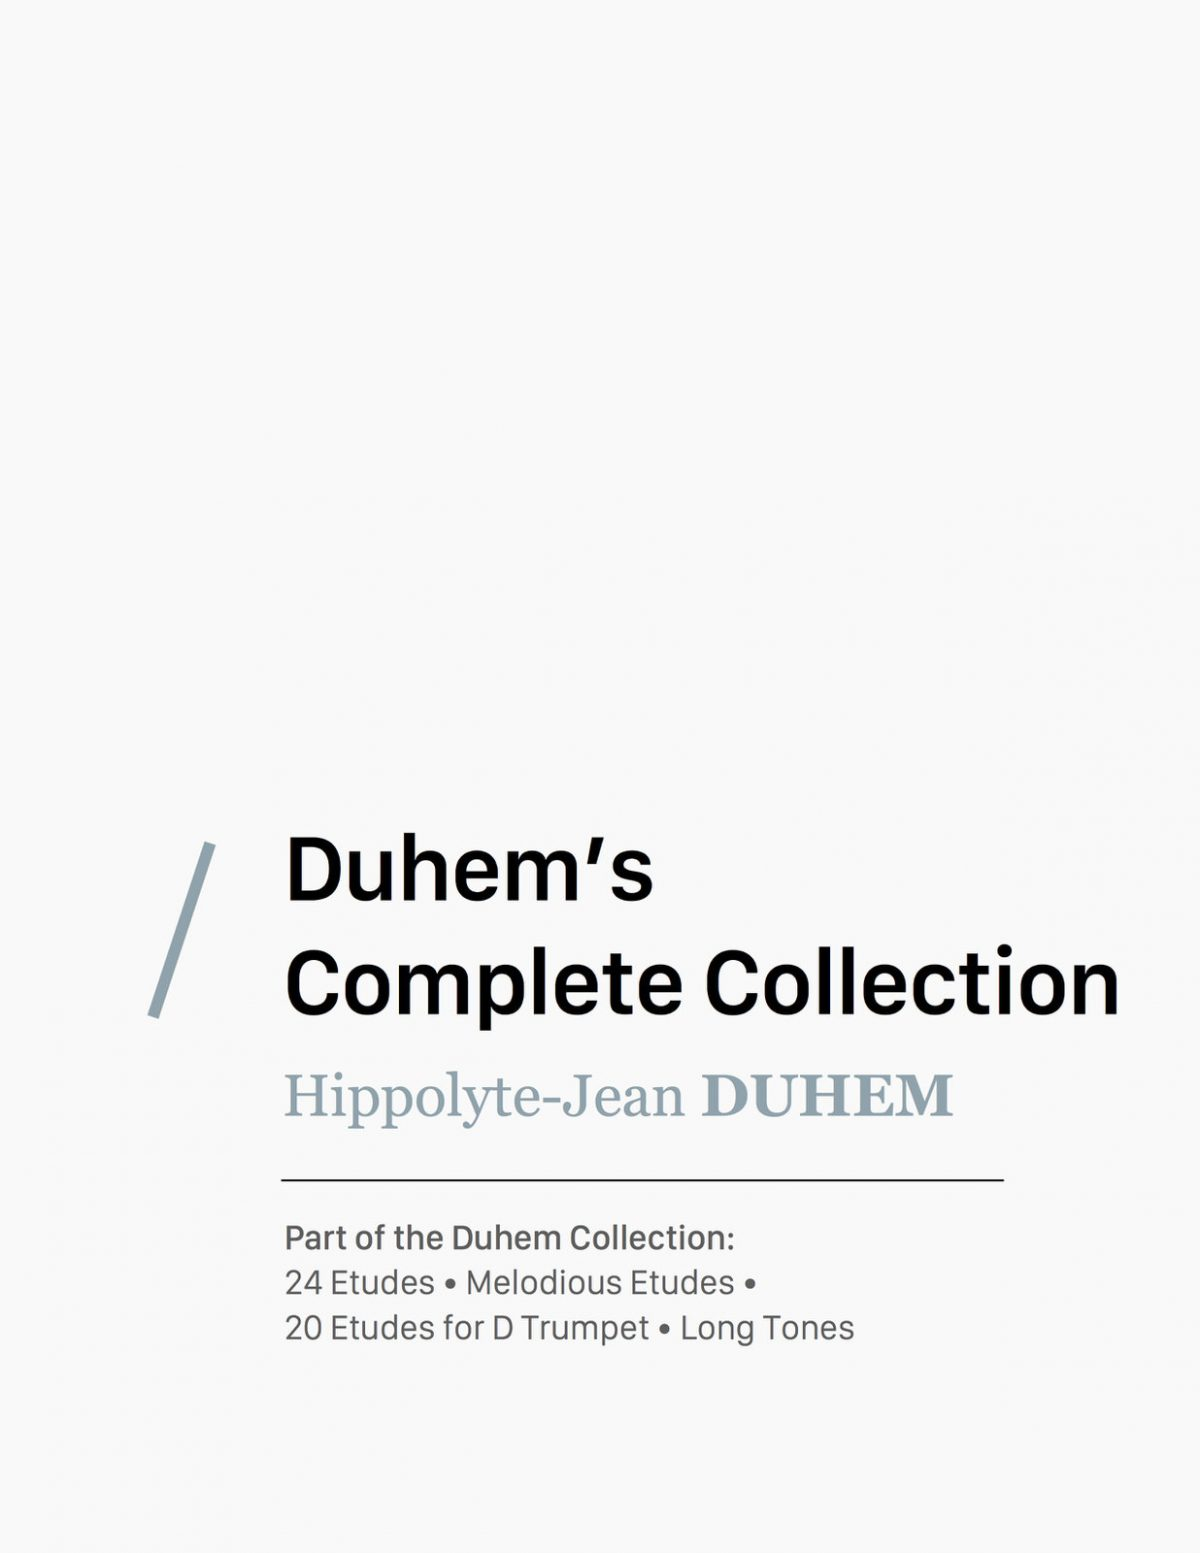 Complete Duhem Collection